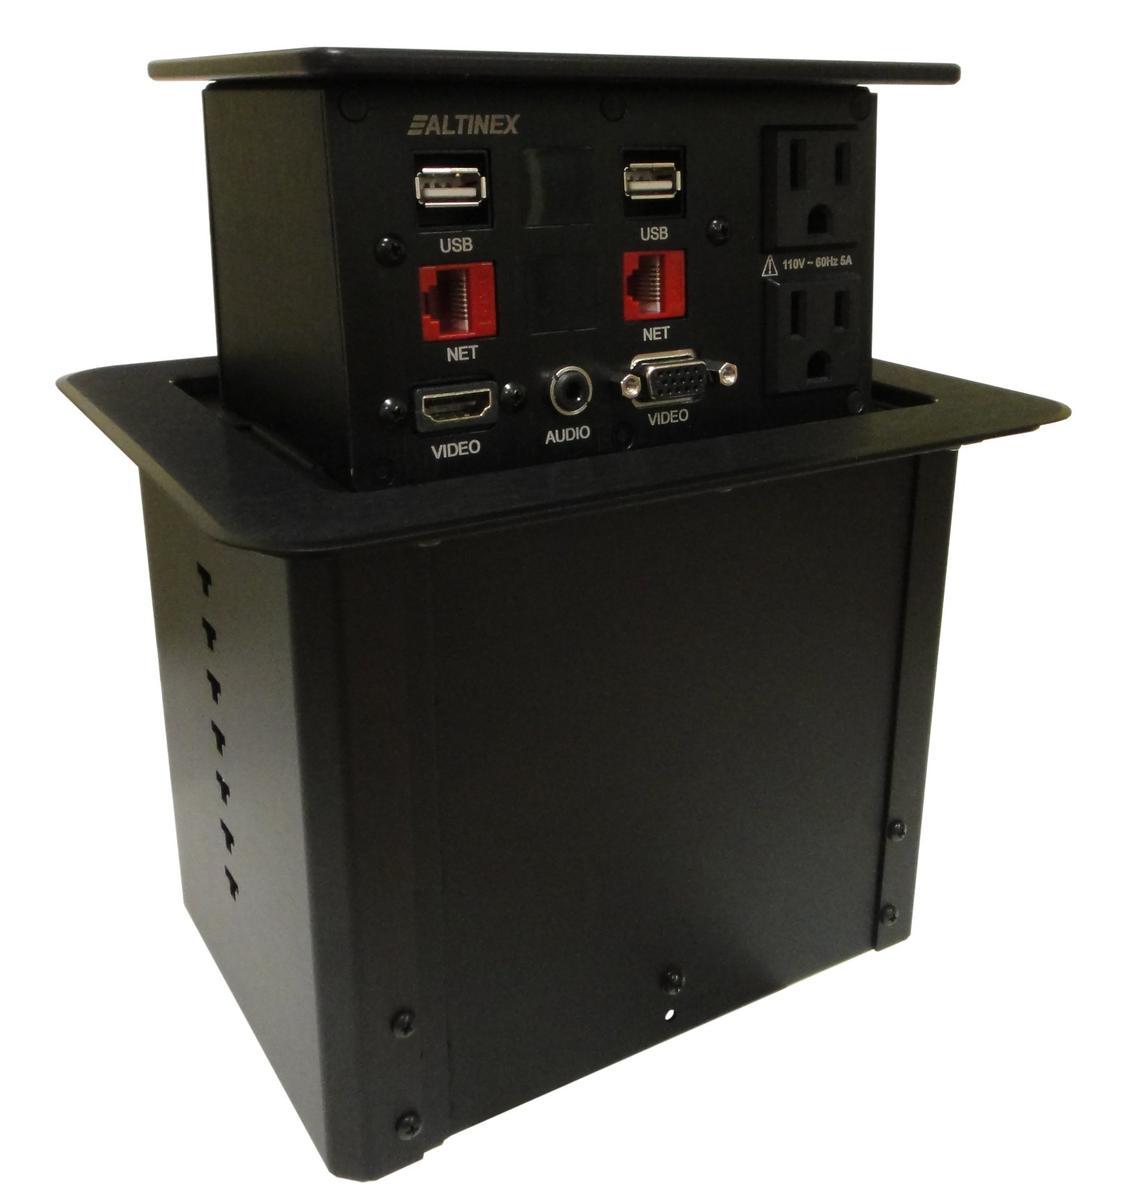 Altinex Pnp408c Customizable Pop Up Table Box 2 Power